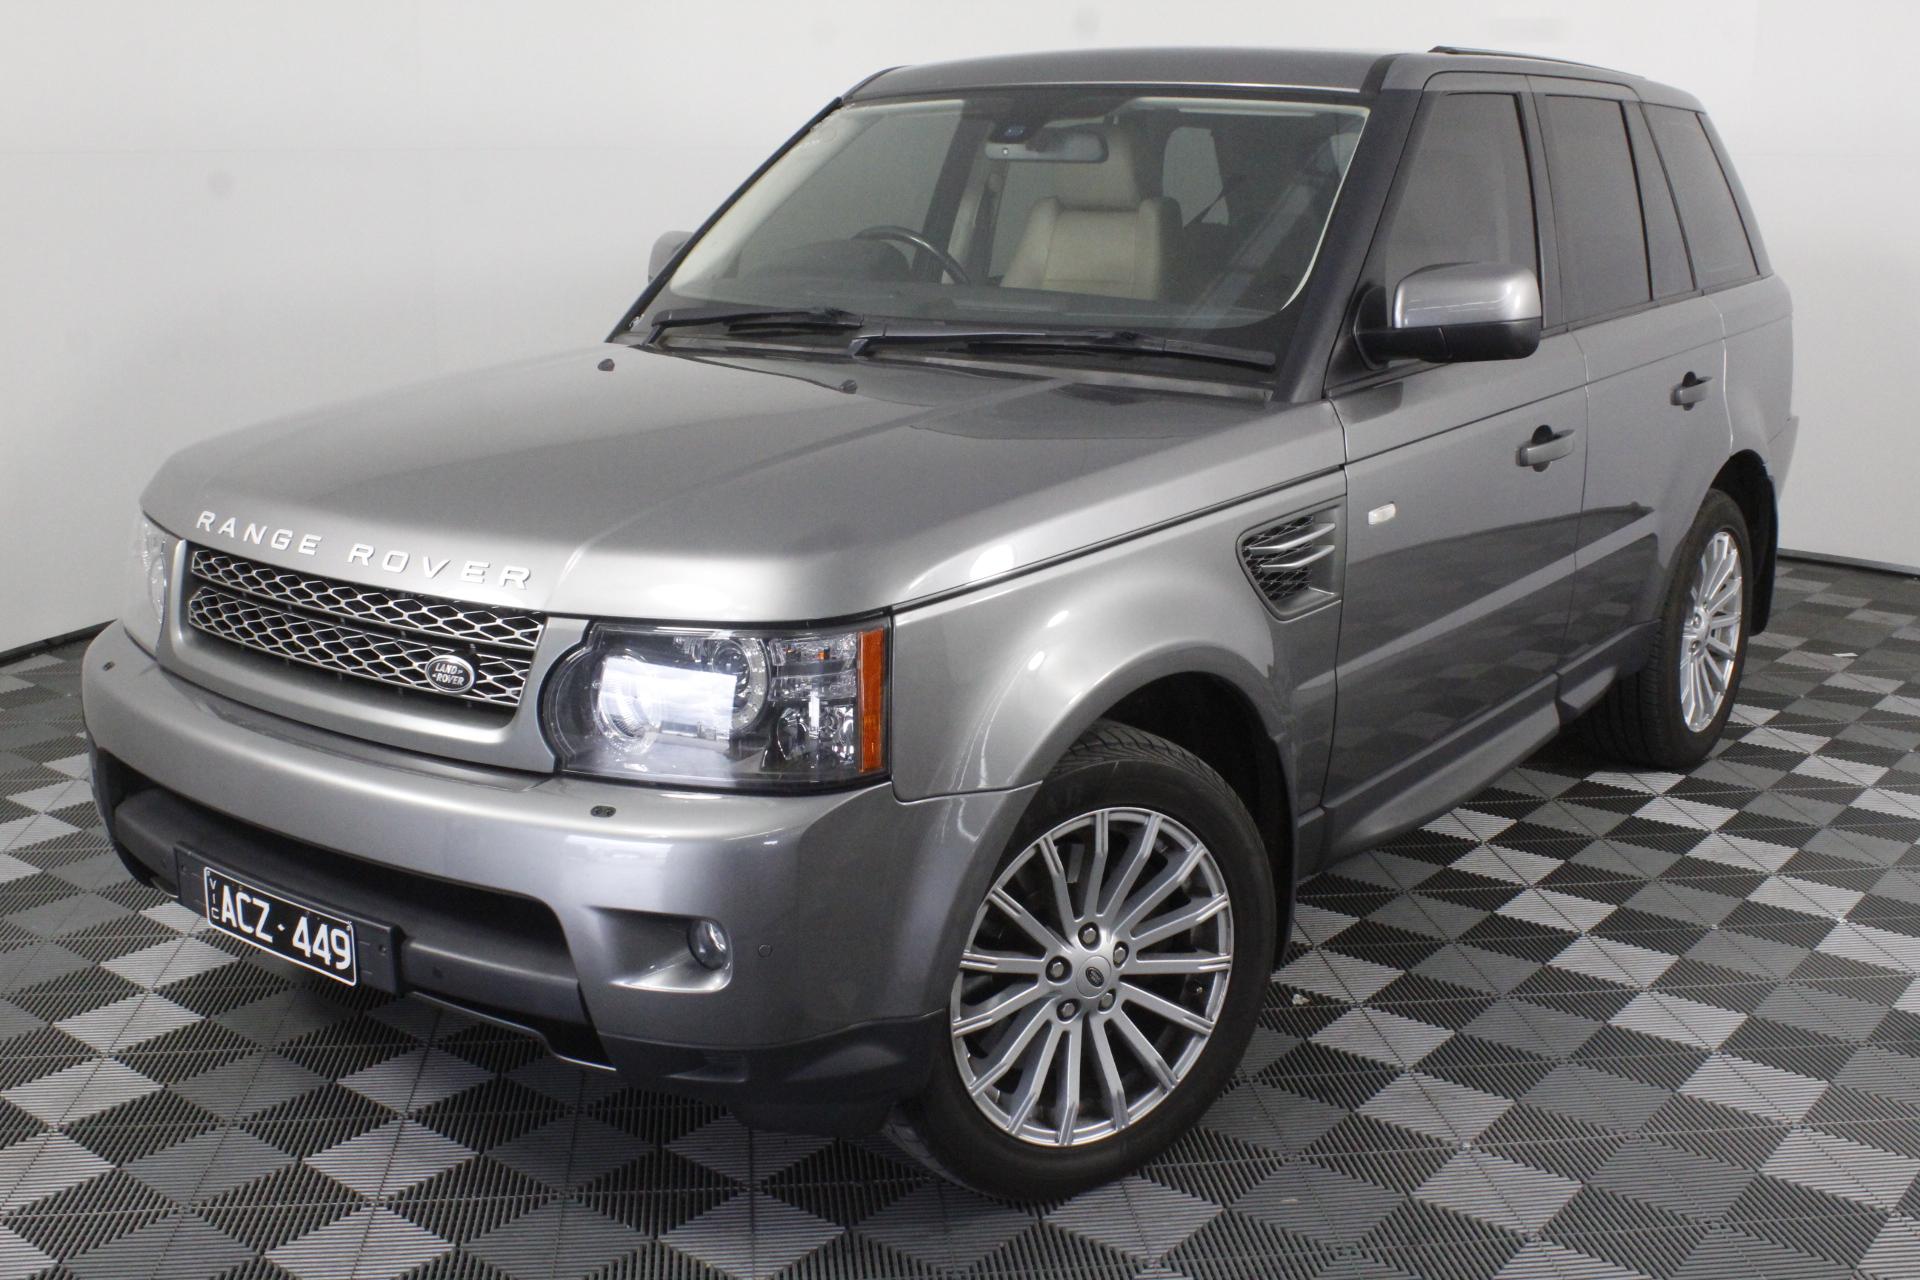 2010 Land Rover Range Rover Sport 3.0 TDV6 Turbo Diesel Automatic Wagon